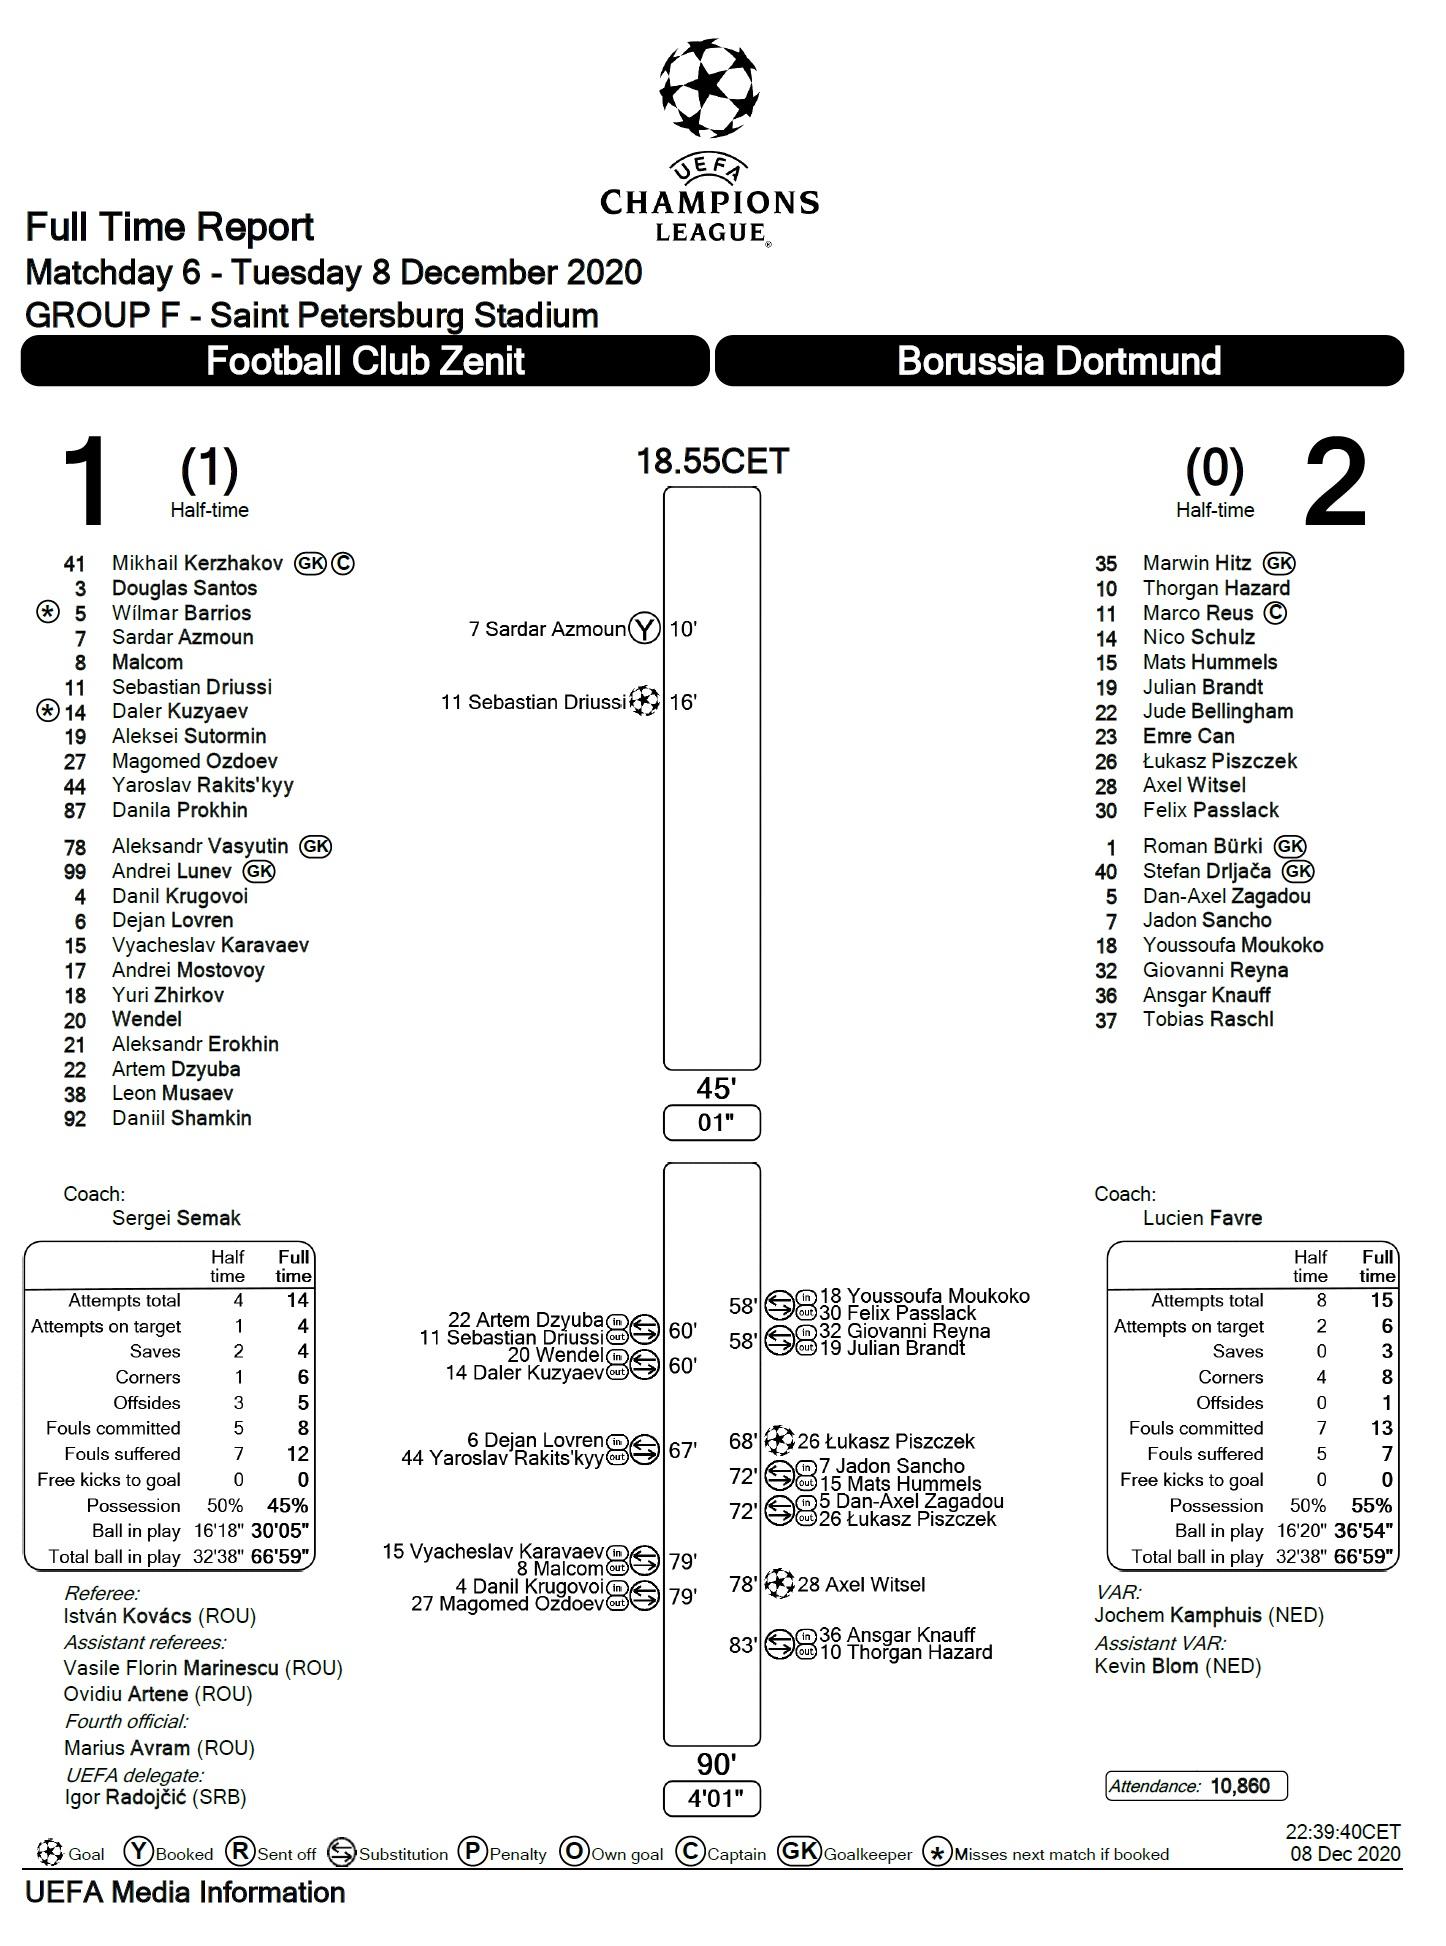 Зенит (Россия) - Боруссия Дортмунд (Германия) 1:2